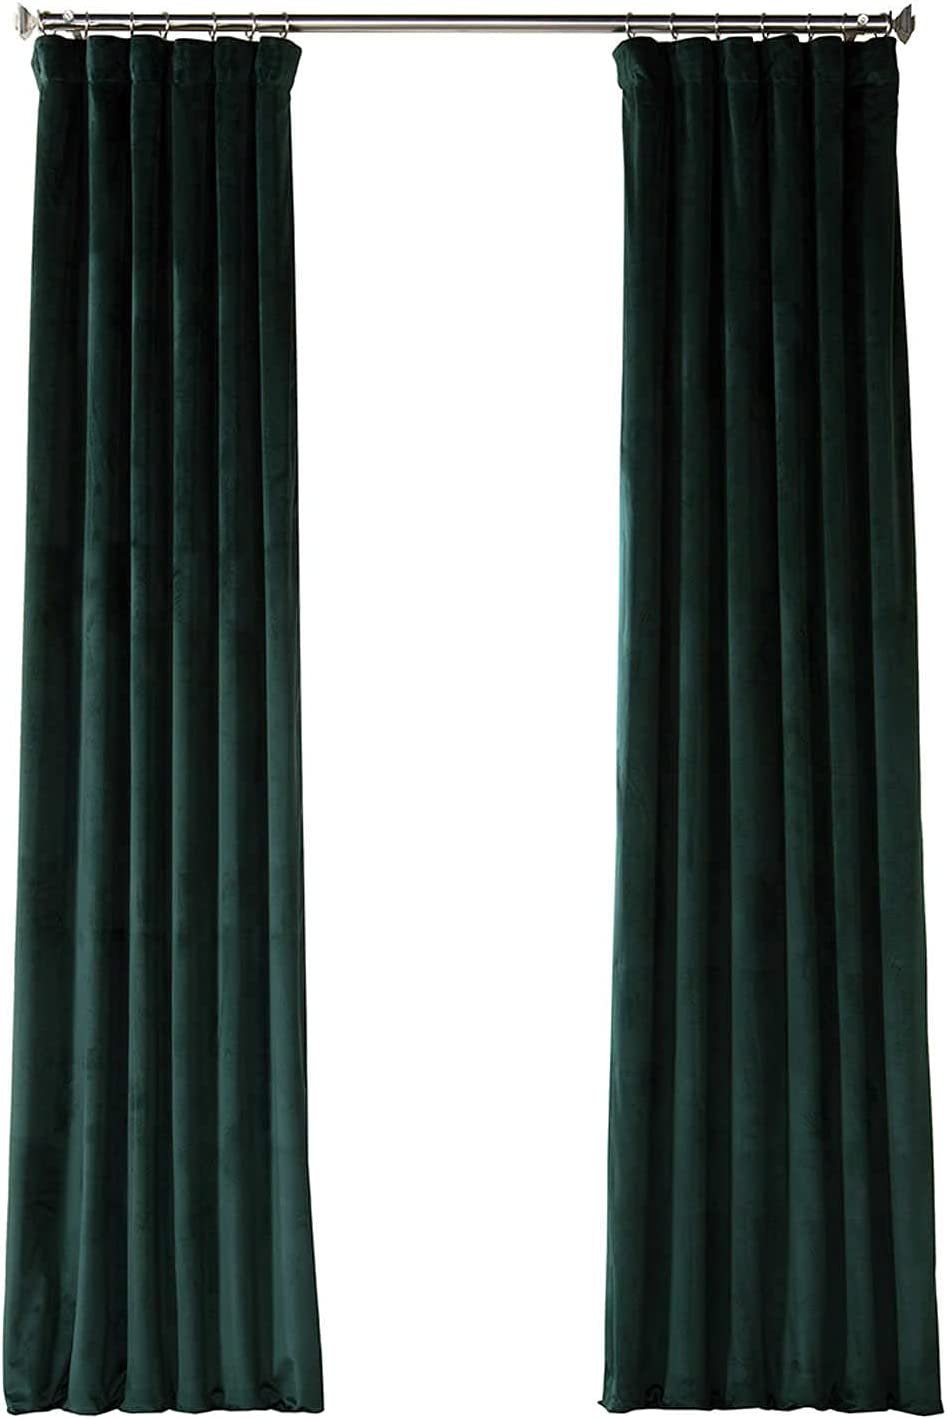 HPD Half Price Drapes VPYC Heritage Plush Velvet CurtainHPD Half Price Drapes VPYC Heritage Plush Velvet Curtain